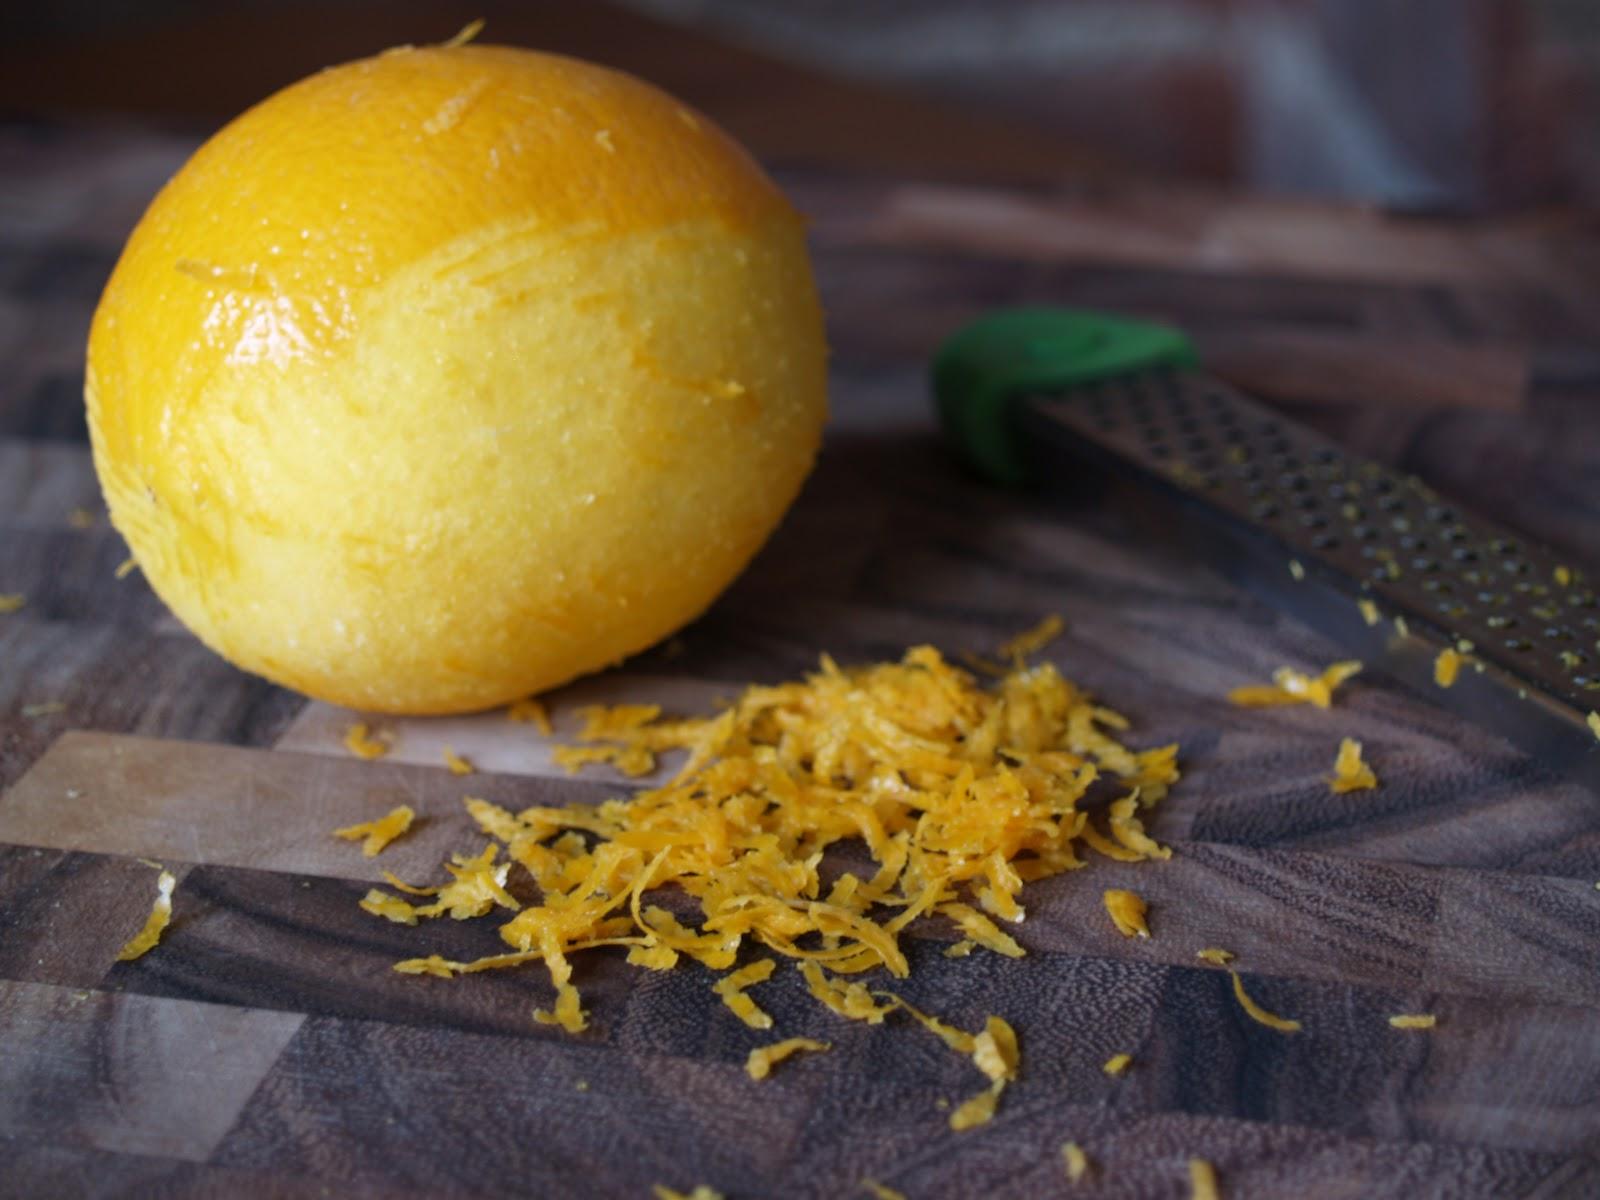 Persimmon and Peach: Meyer Lemon Sorbet